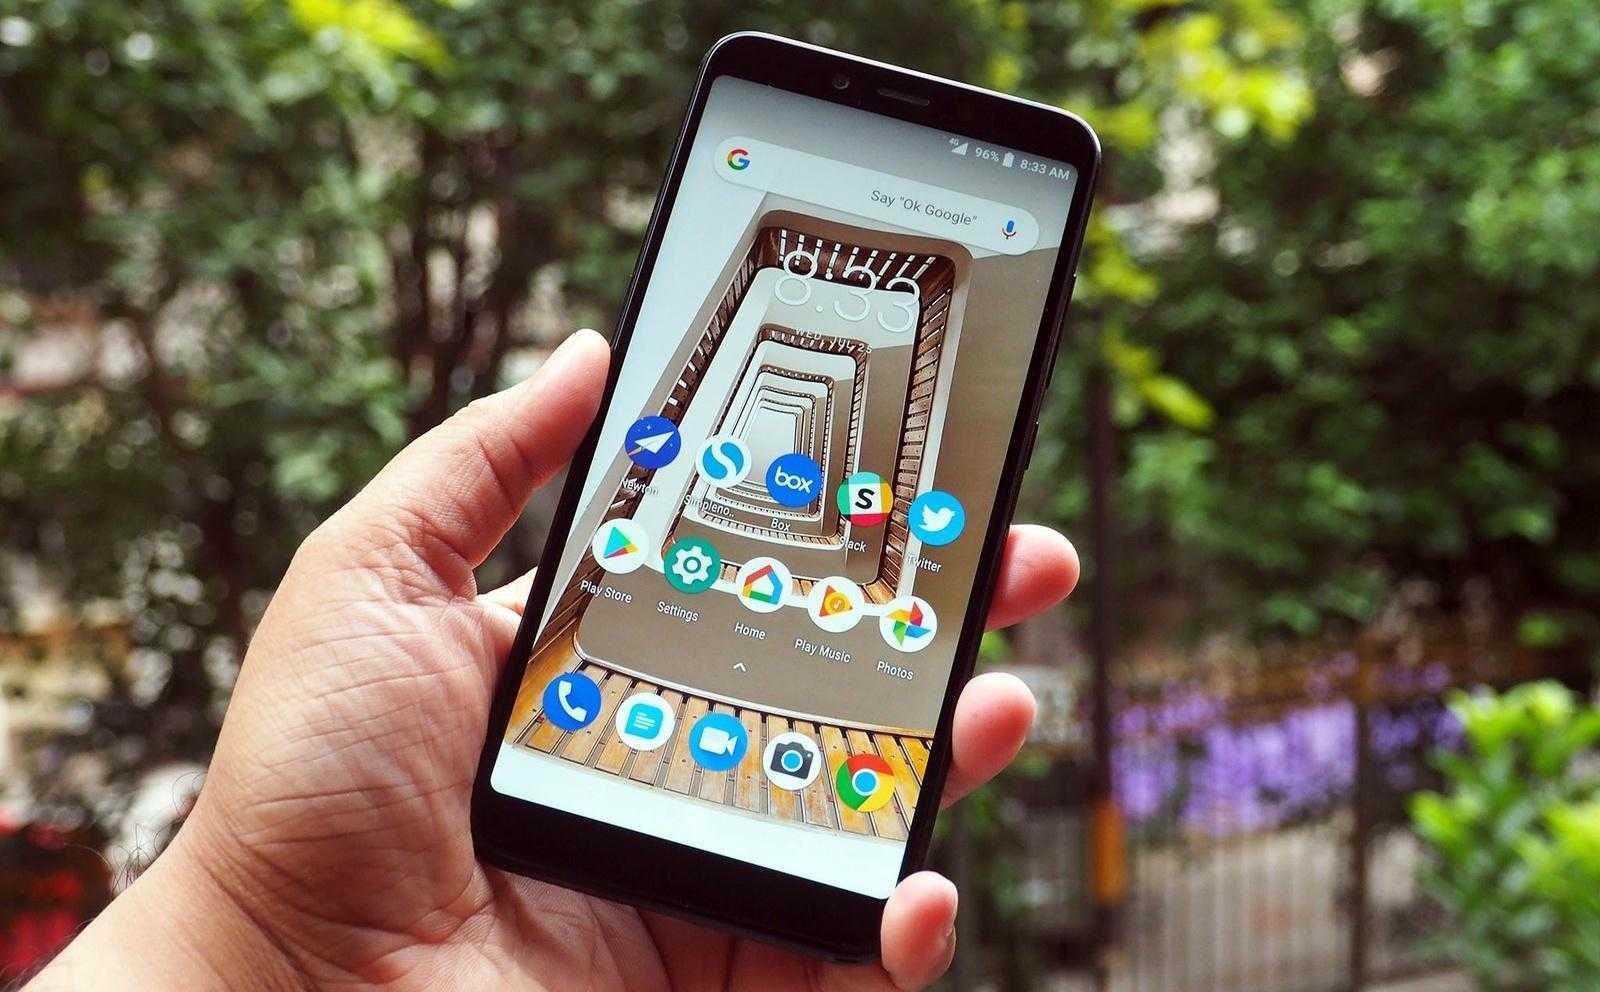 ТОП-5 причин купить Xiaomi Mi A2 (xiaomi mi a2 e1532515704149)